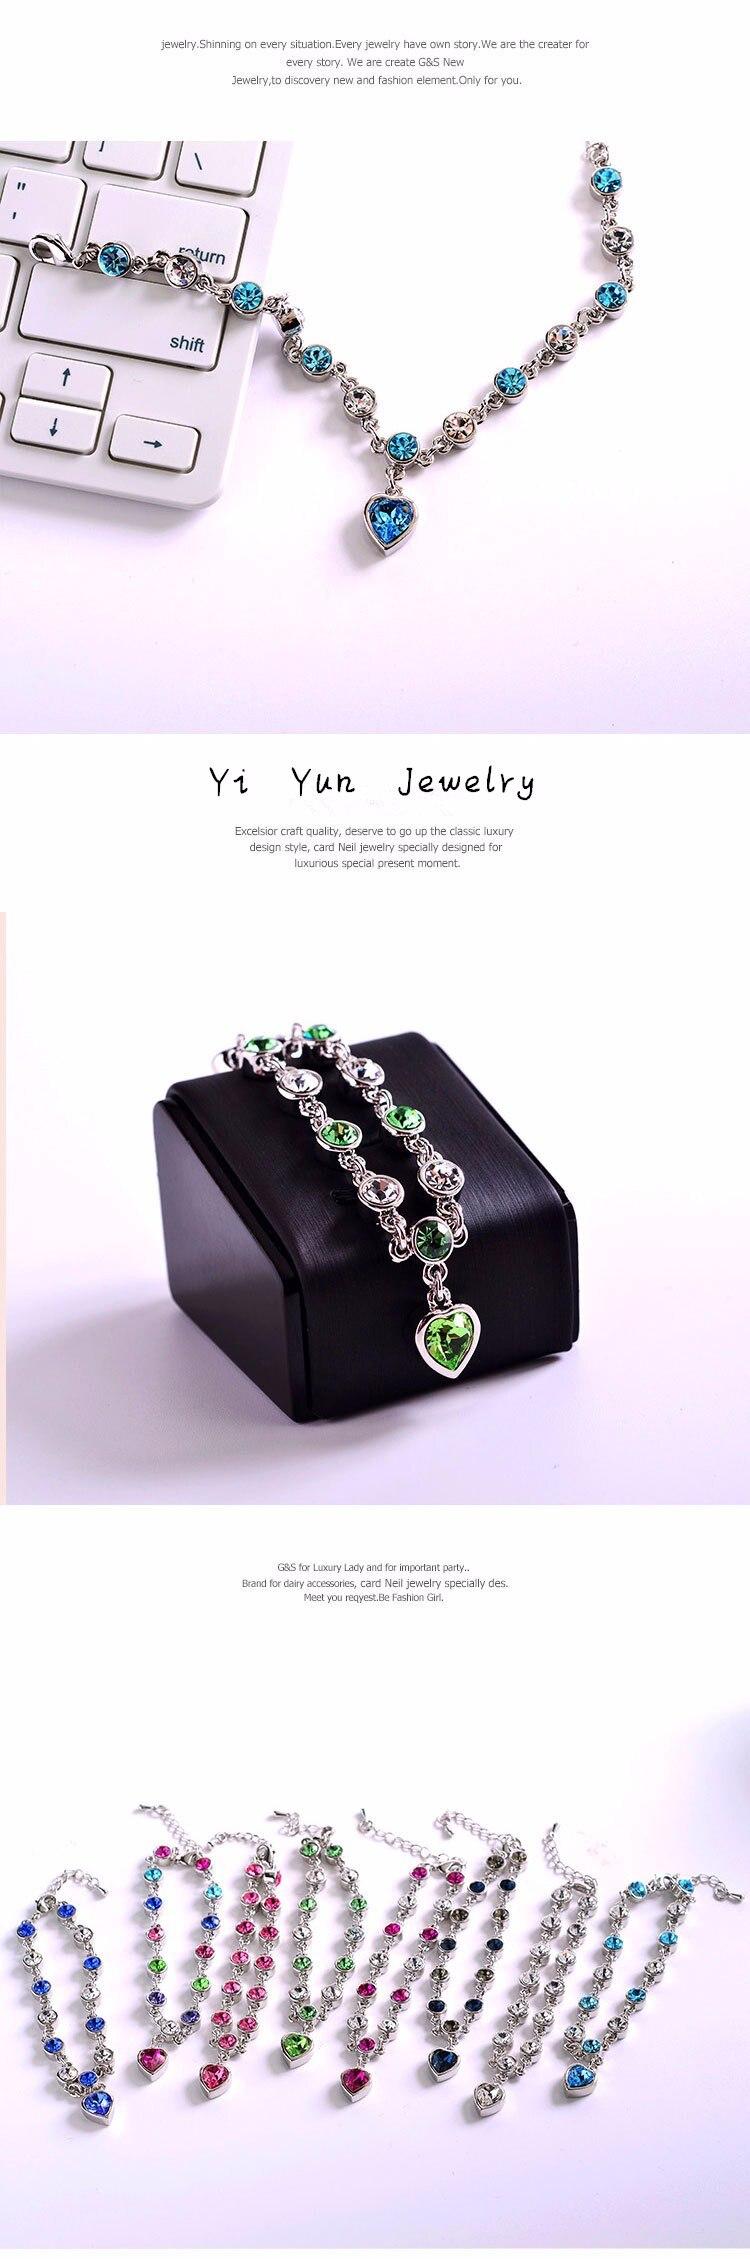 LYIYUNQ Fashion Bracelet Hot Wedding Female Heart Crystal Bracelets For Women Luxury Temperament Silver-Color Fine Jewelry Gift 10